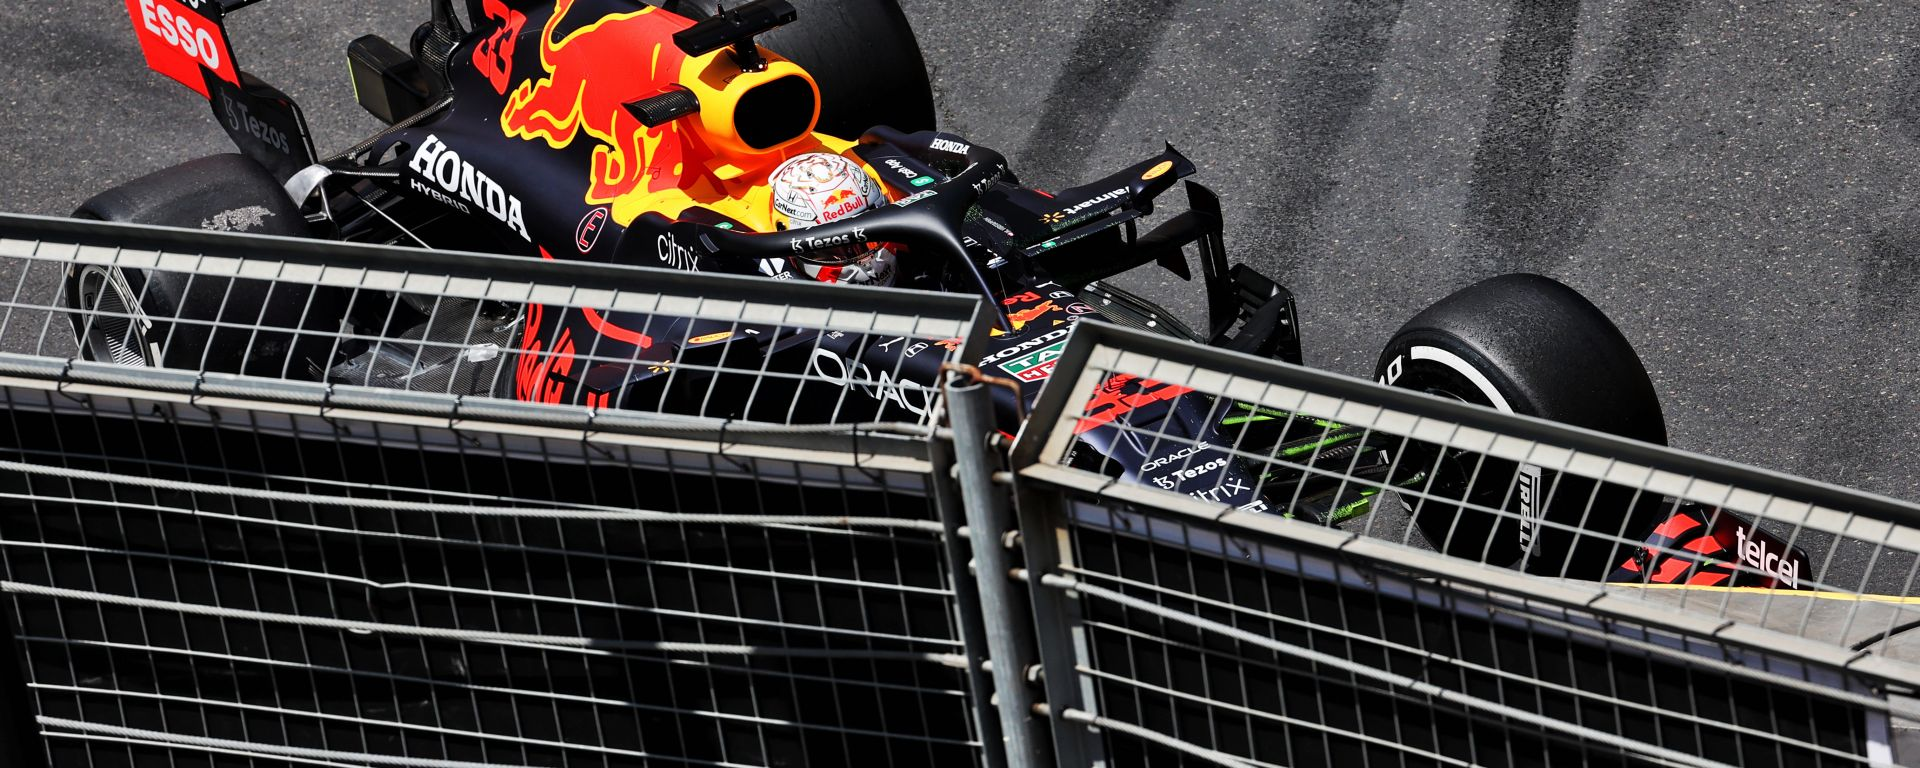 F1 GP Azerbaijan 2021, Baku: Max Verstappen (Red Bull Racing) contro il muro